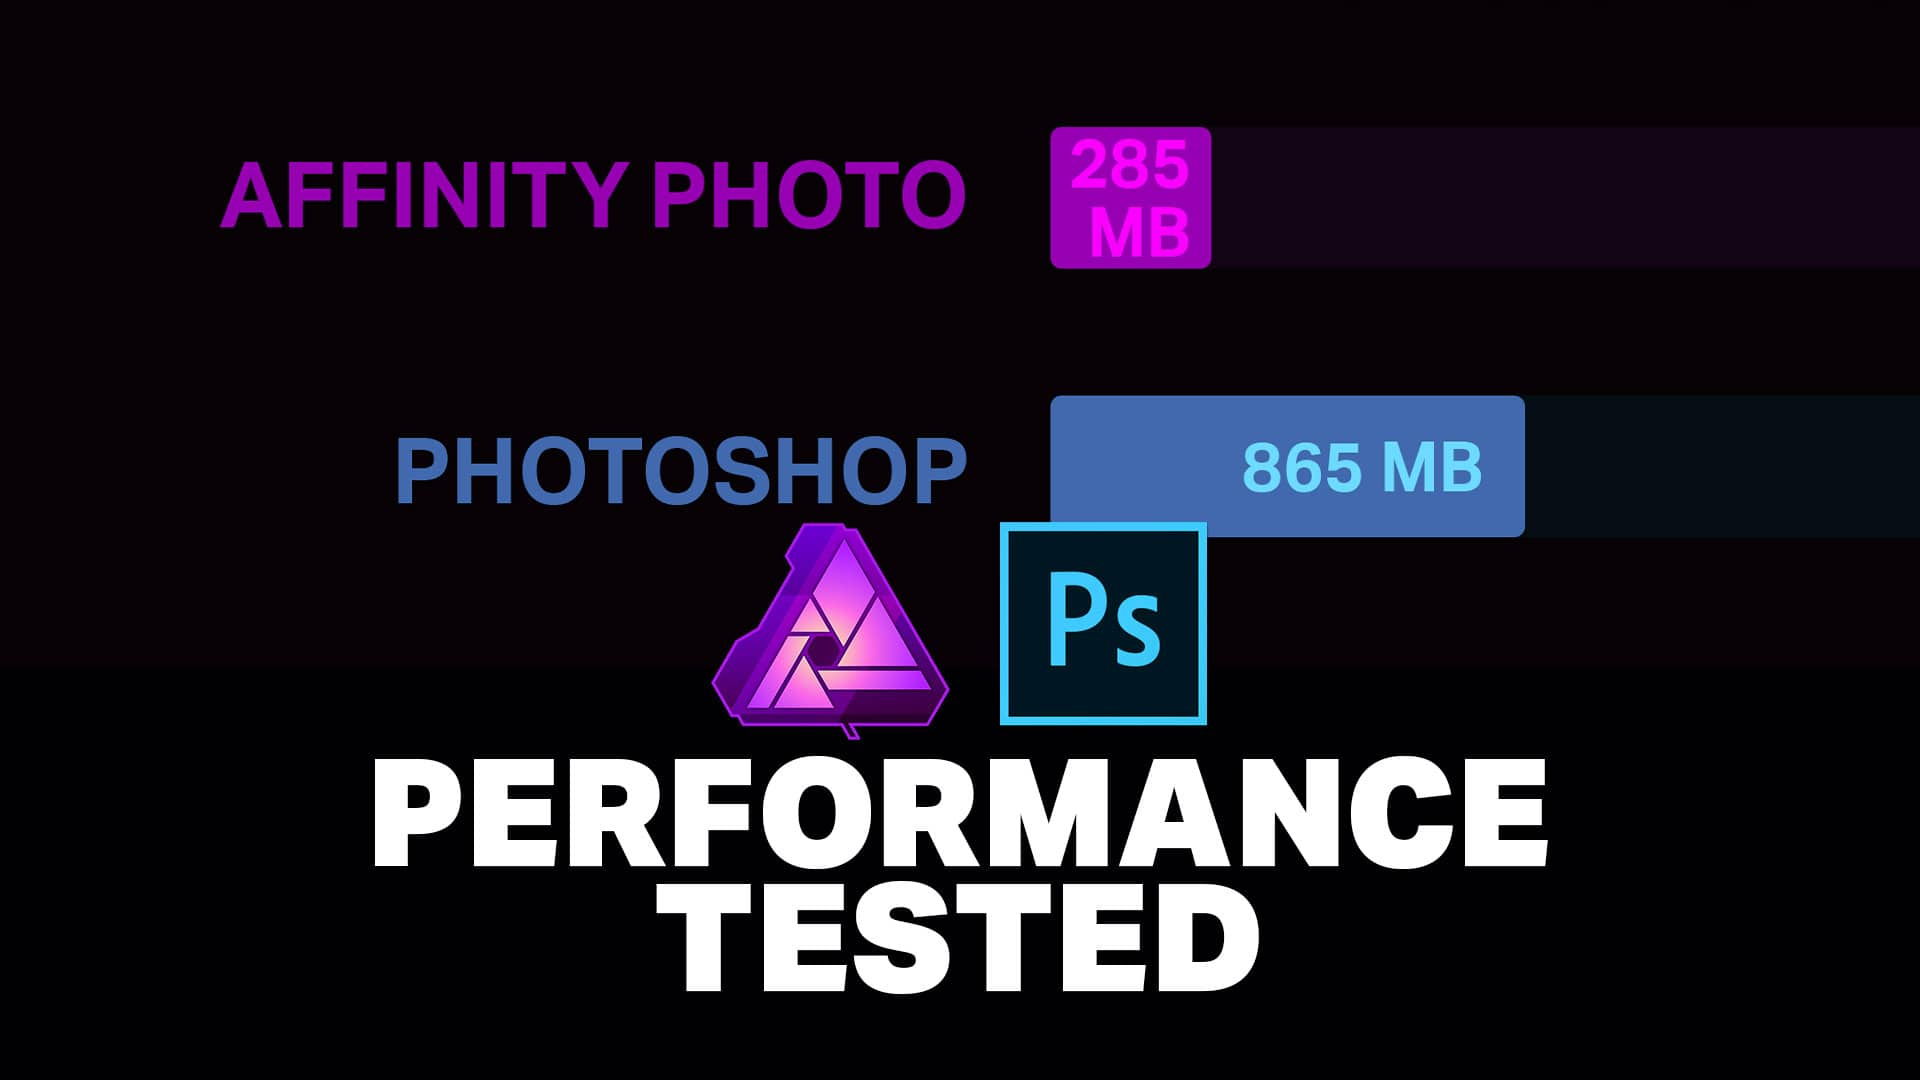 Affinity Photo vs Photoshop Benchmark